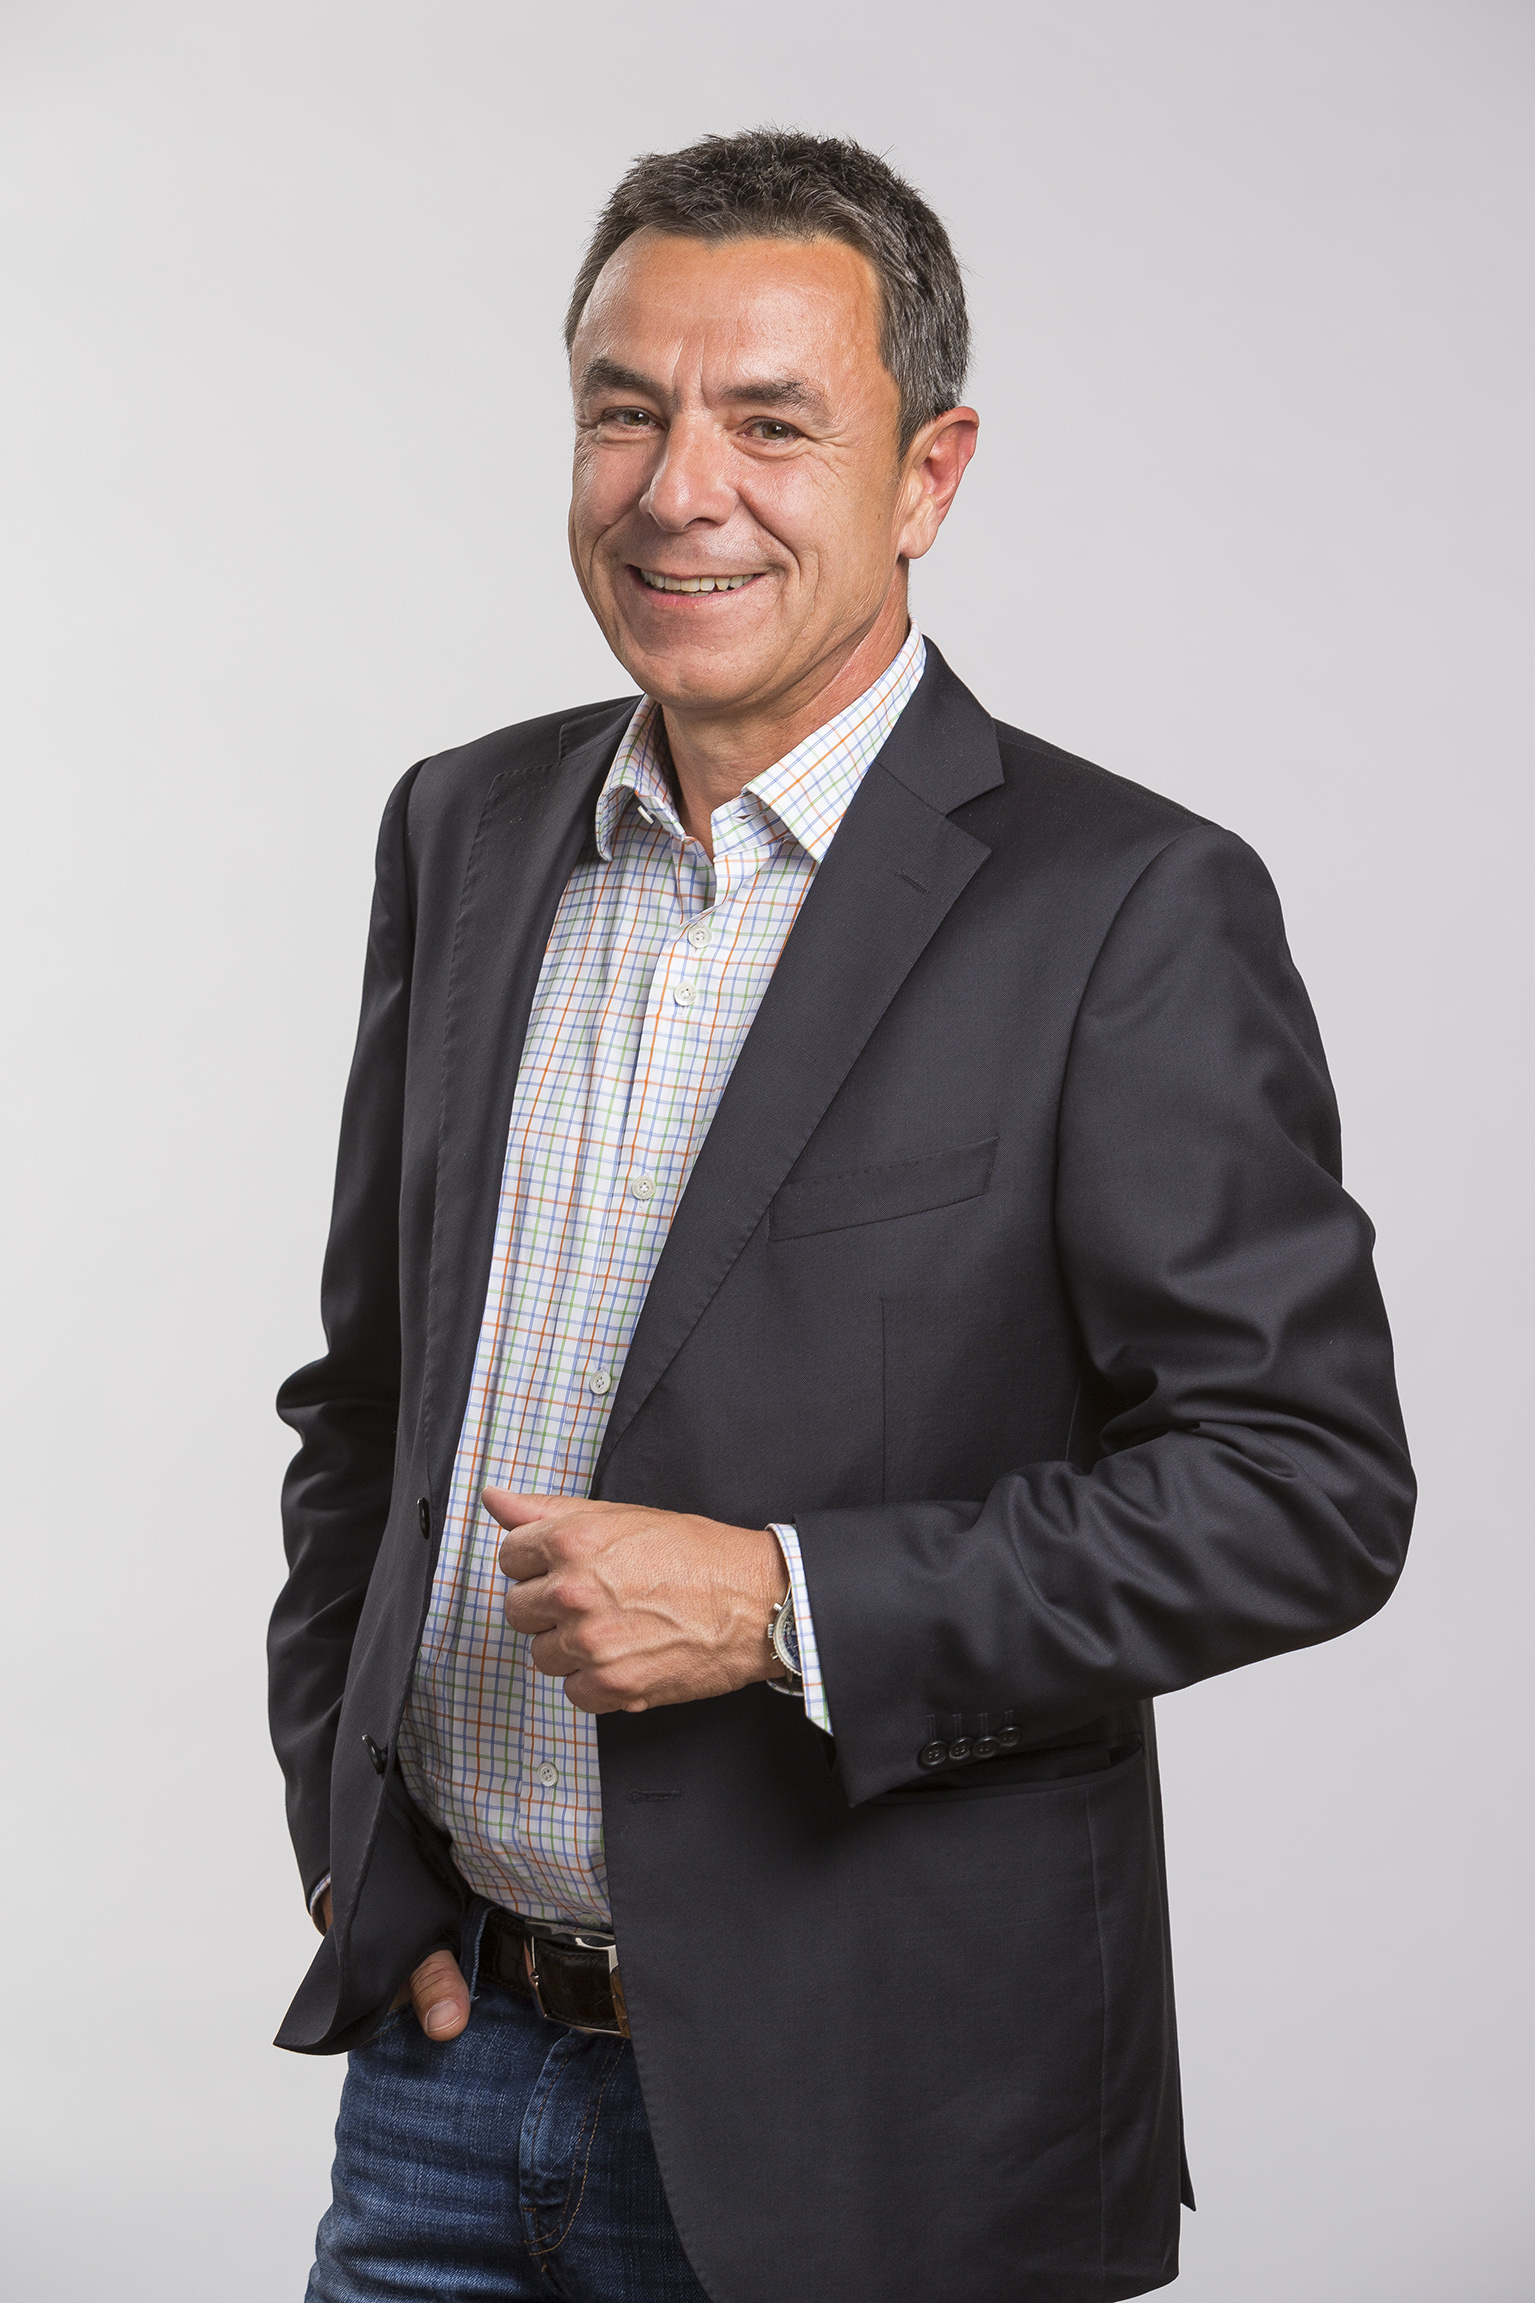 Dietmar Schnabel, Regional Director Central Europe, Check Point